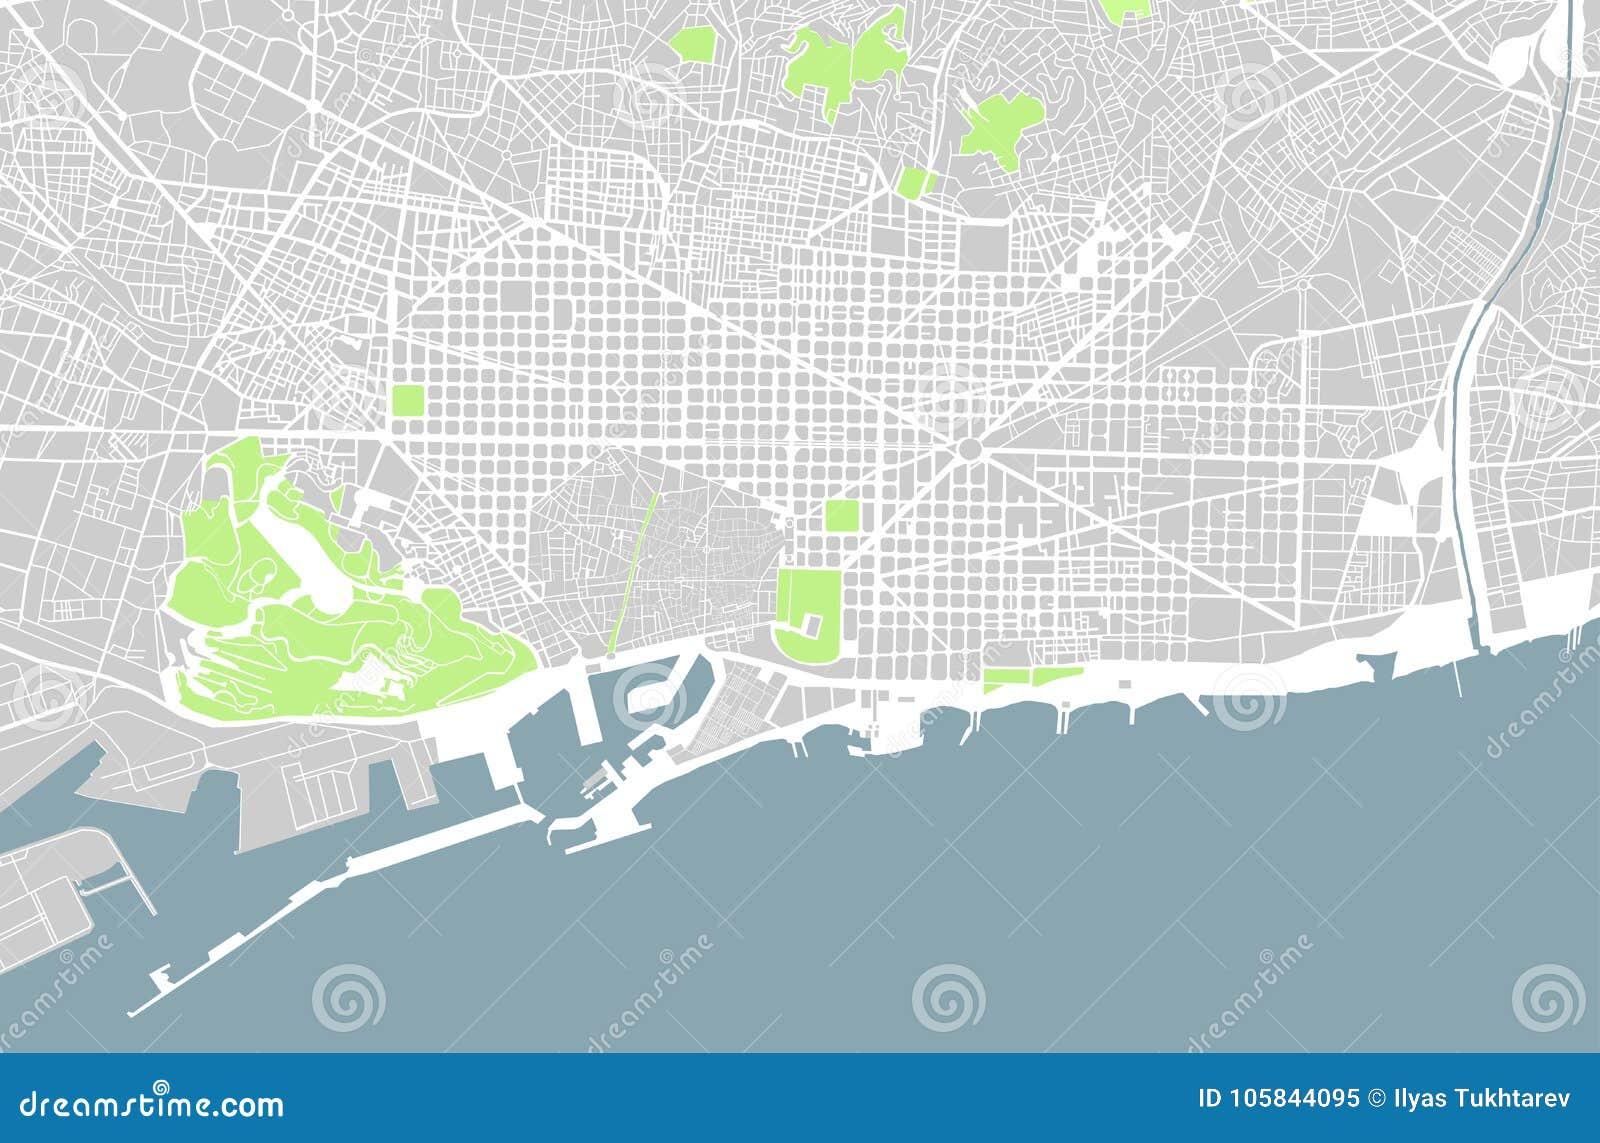 Carte Barcelone Place Despagne.Carte De Ville De Barcelone Espagne Illustration Stock